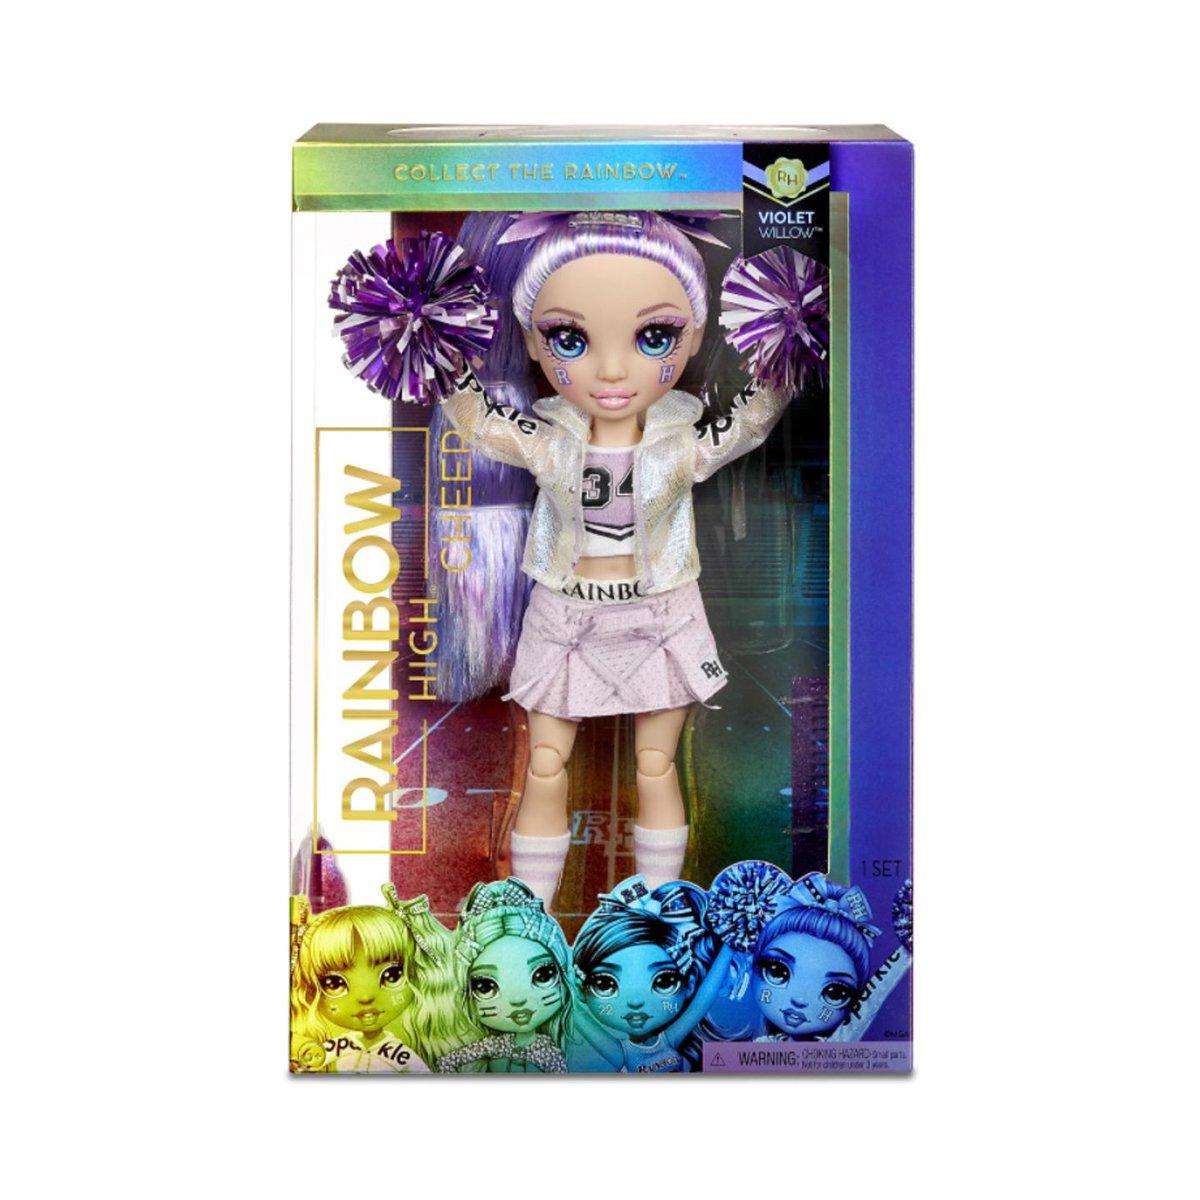 Papusa Majoreta Rainbow High, Violet Willow, 572084EUC